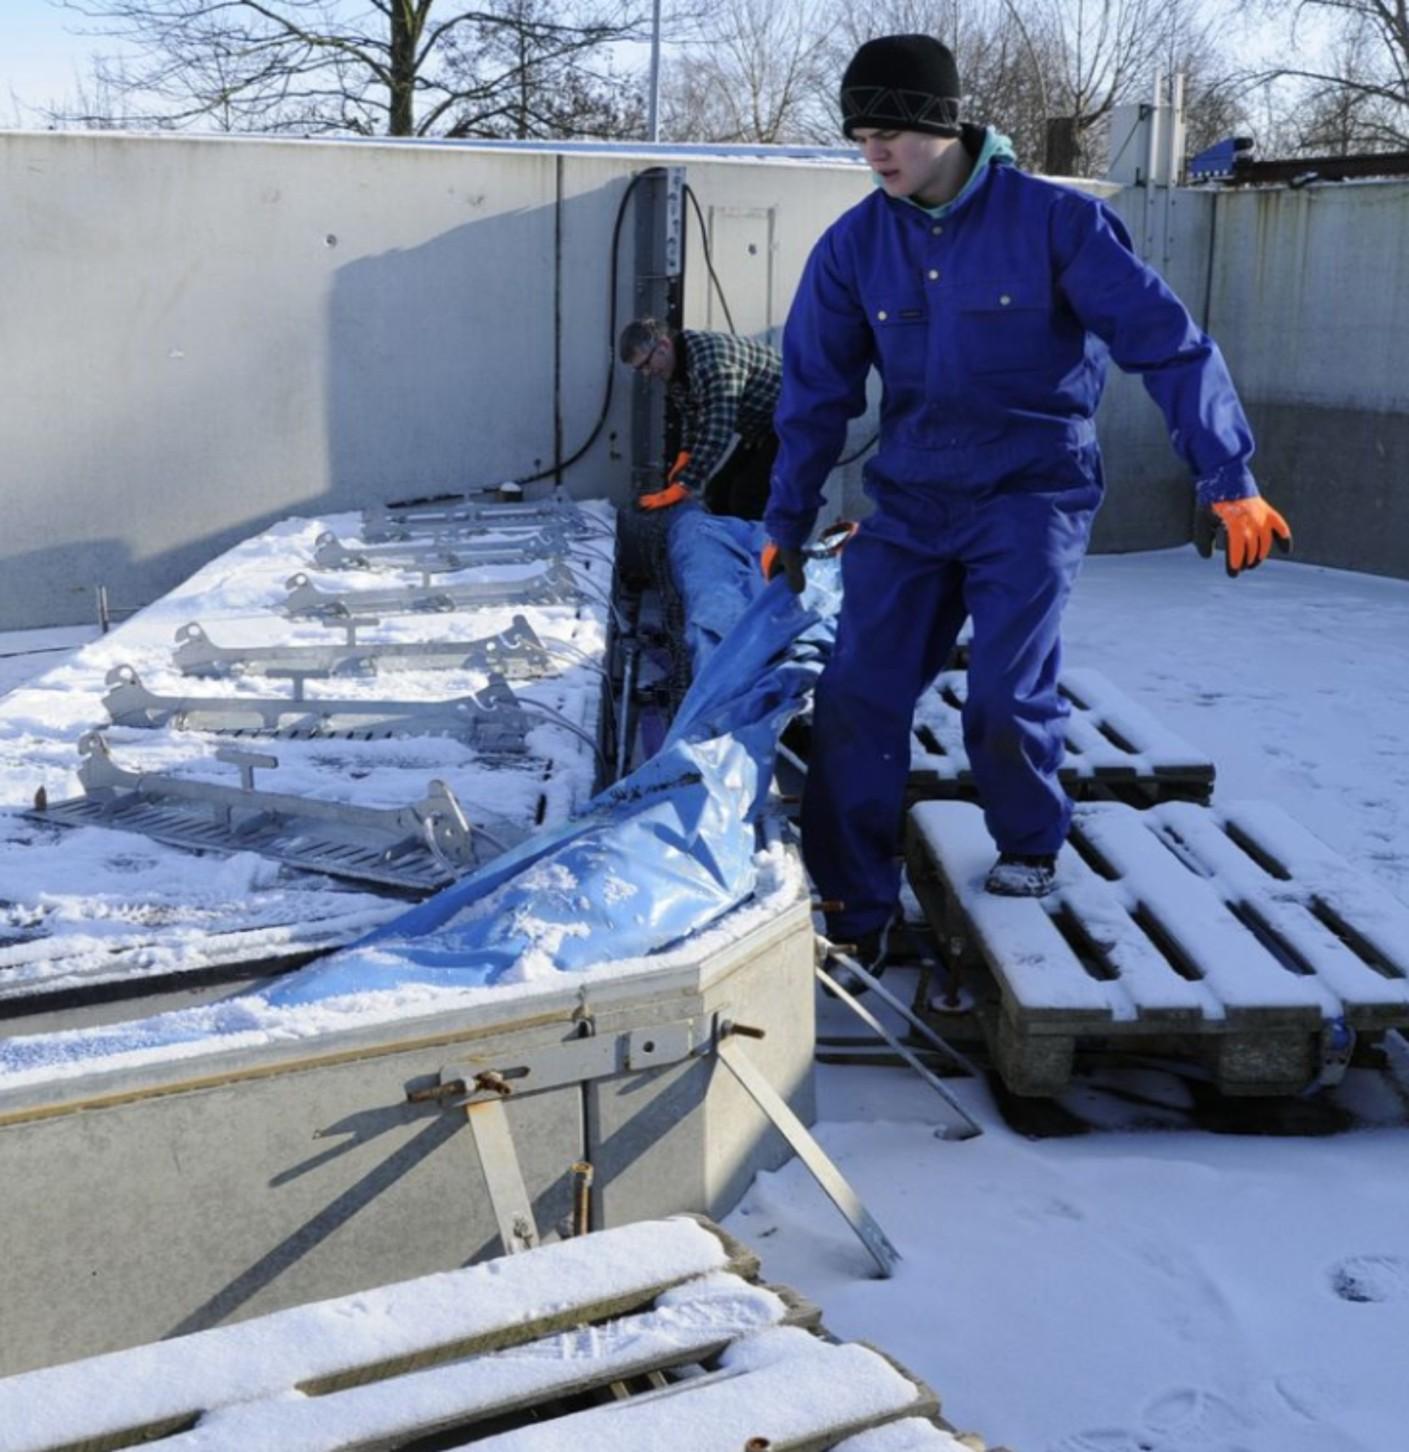 aquaburg-aktuelles-extremtest-extrembelastung-aufbau-winter-plane